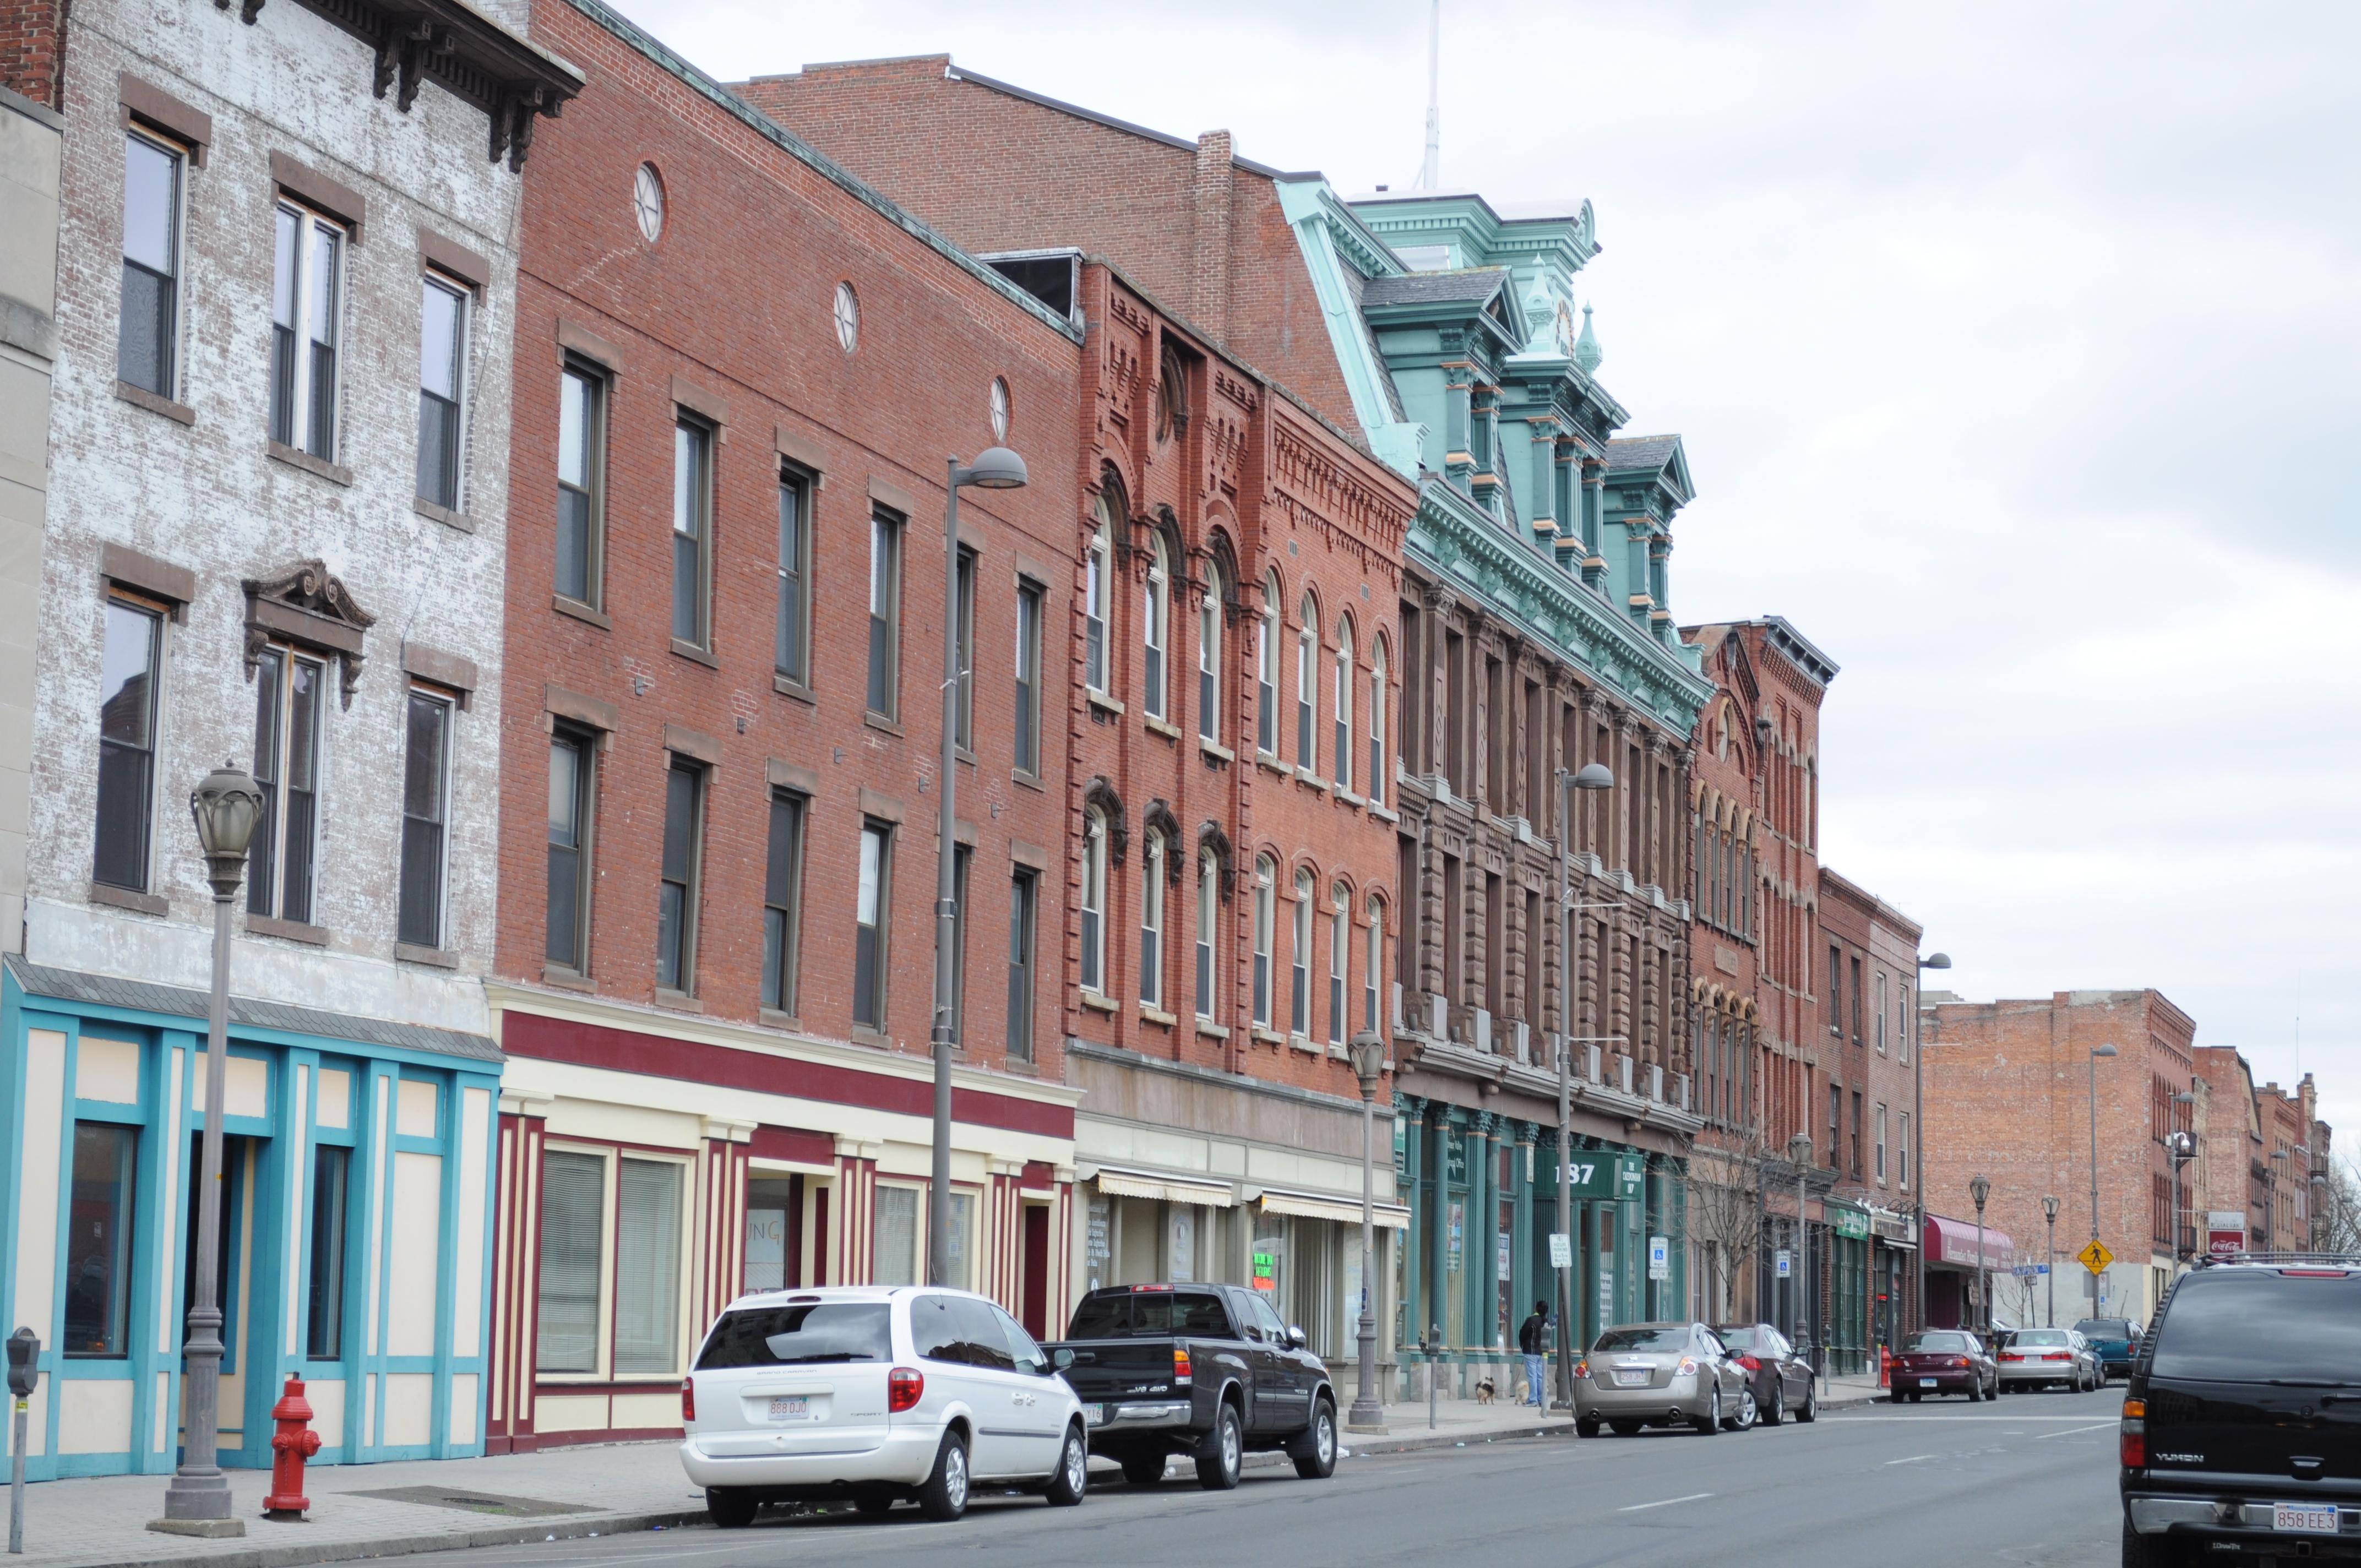 Holyoke (MA) United States  city photos gallery : Holyoke, MA High Street 01 Wikimedia Commons